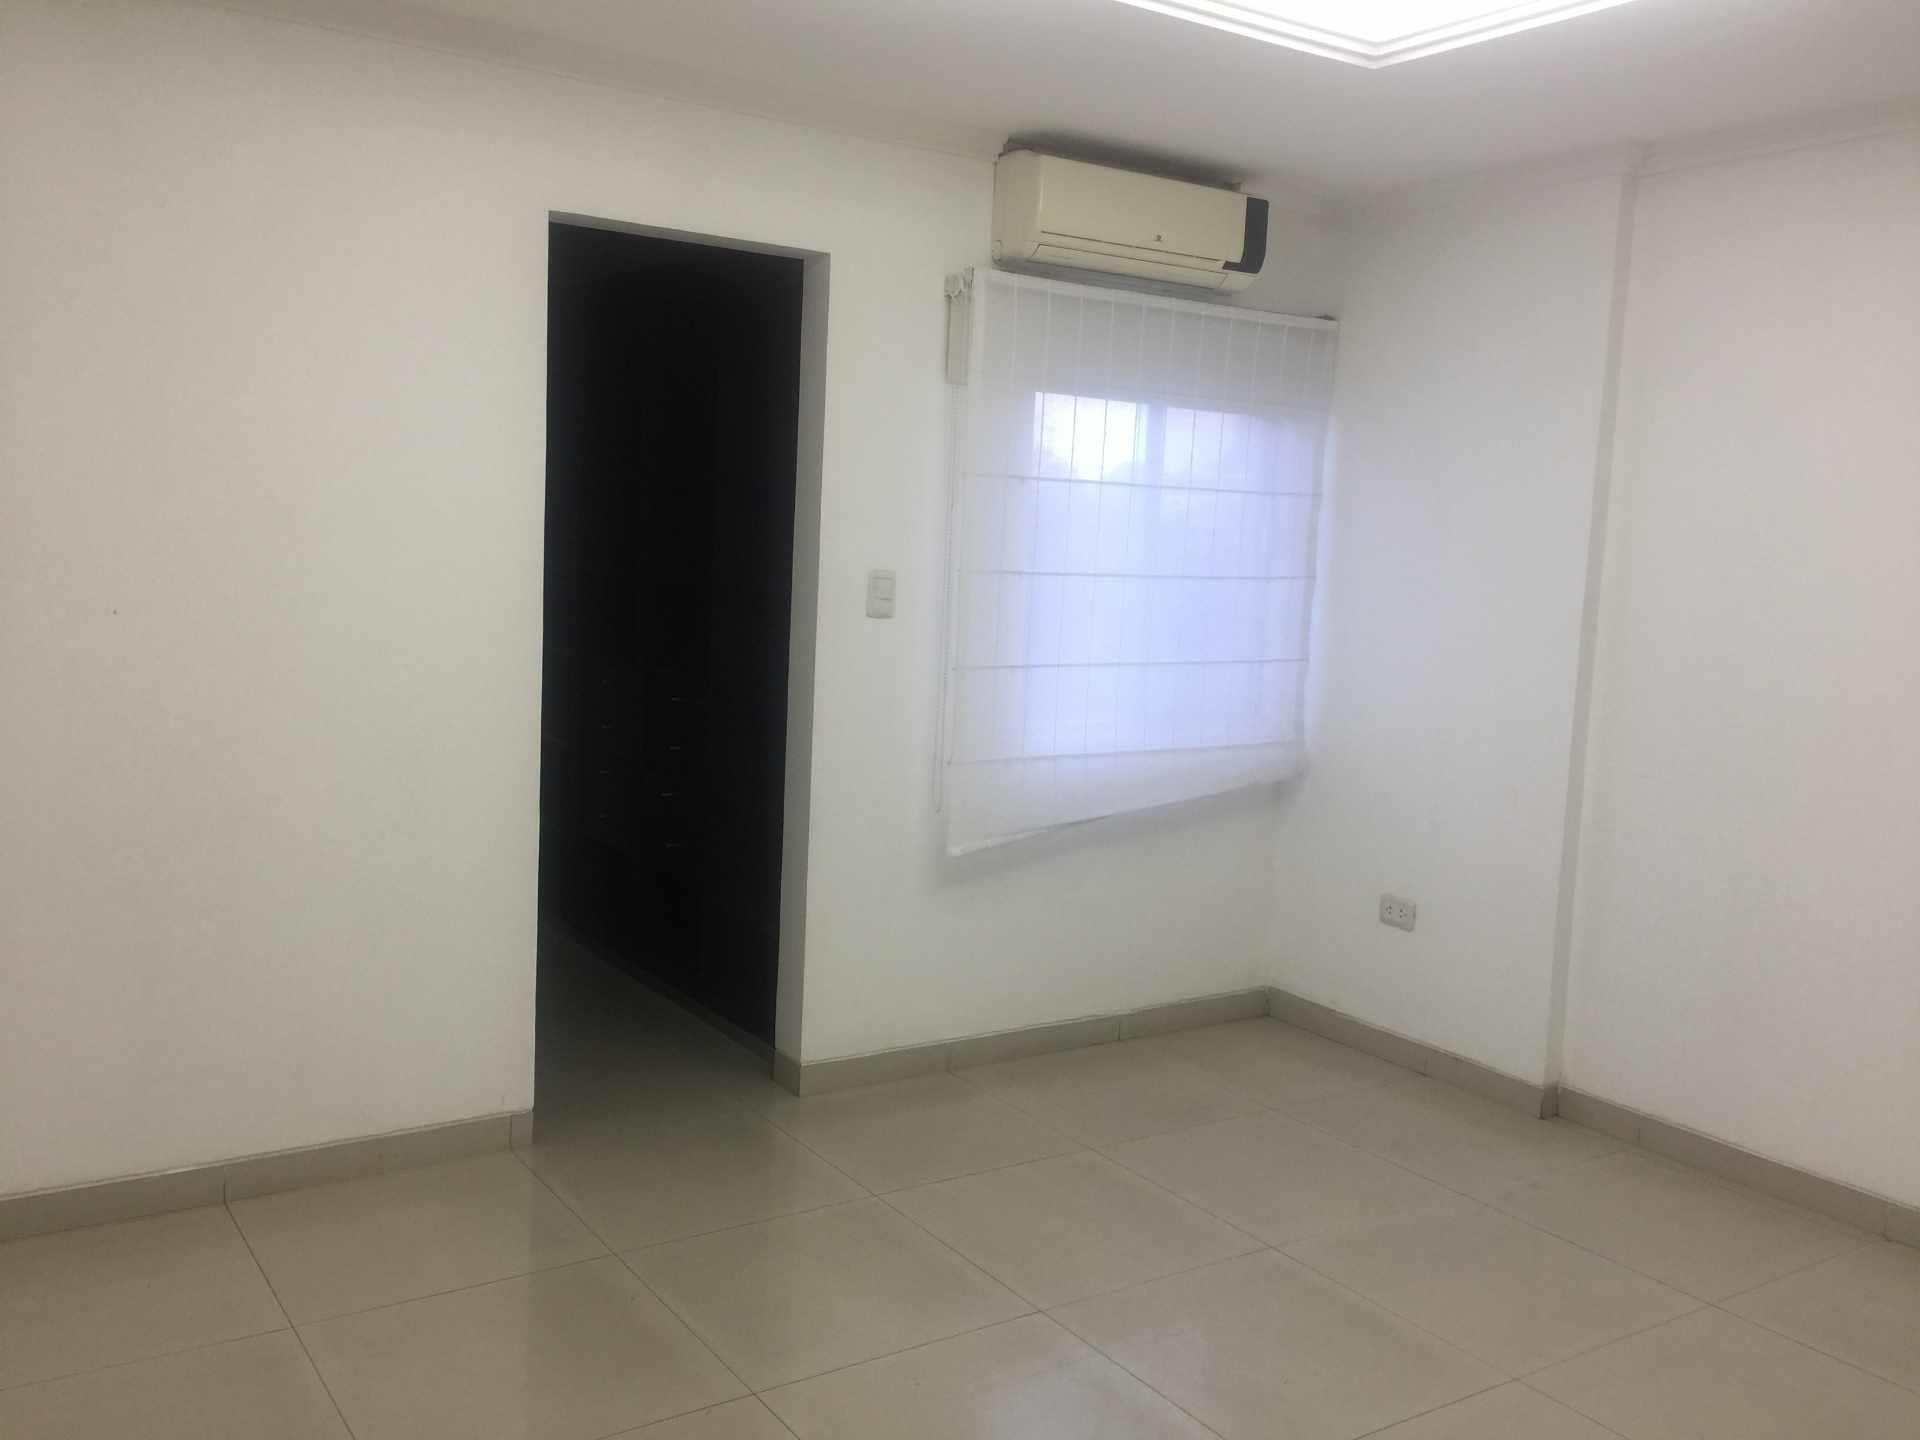 Departamento en Alquiler Calle Yaguarú, Condominio Las Palmas Residence Foto 7